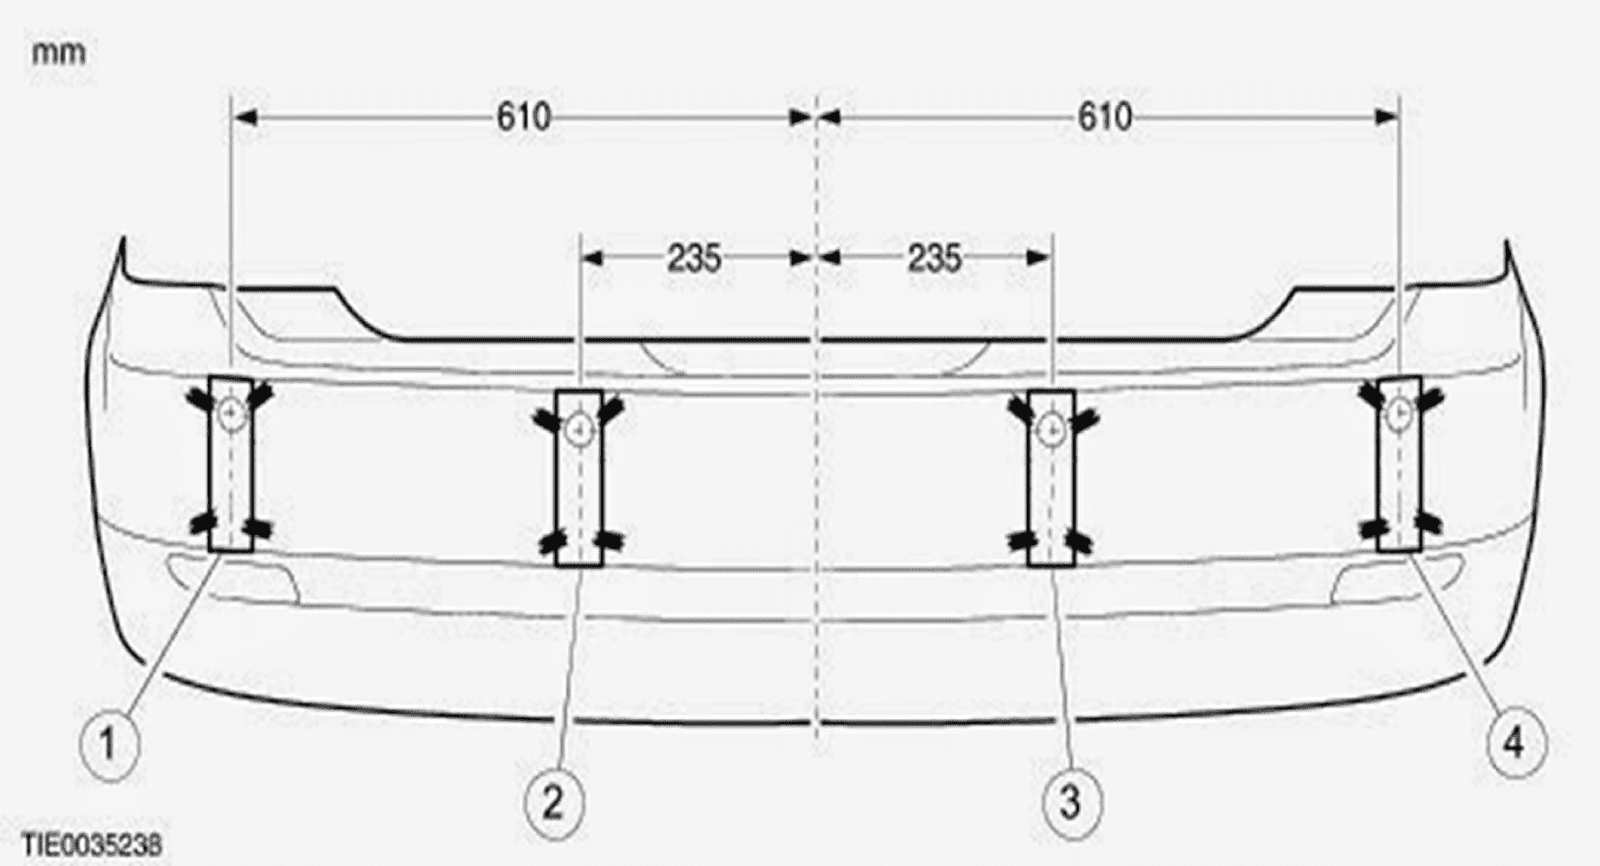 park sensörü ölçüleri